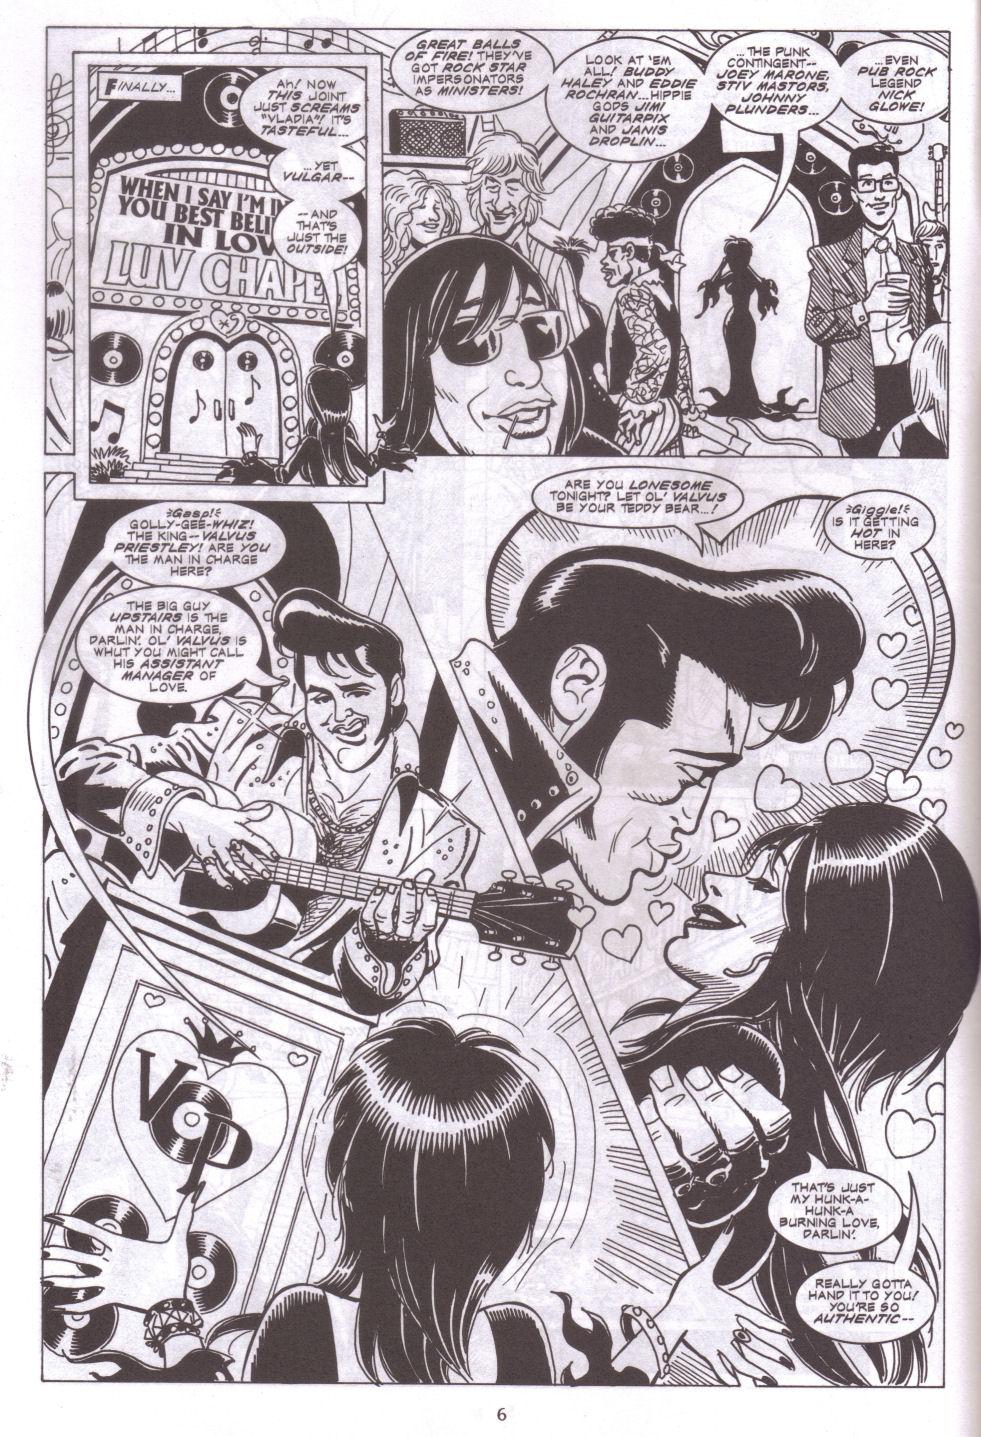 Read online Elvira, Mistress of the Dark comic -  Issue #127 - 8